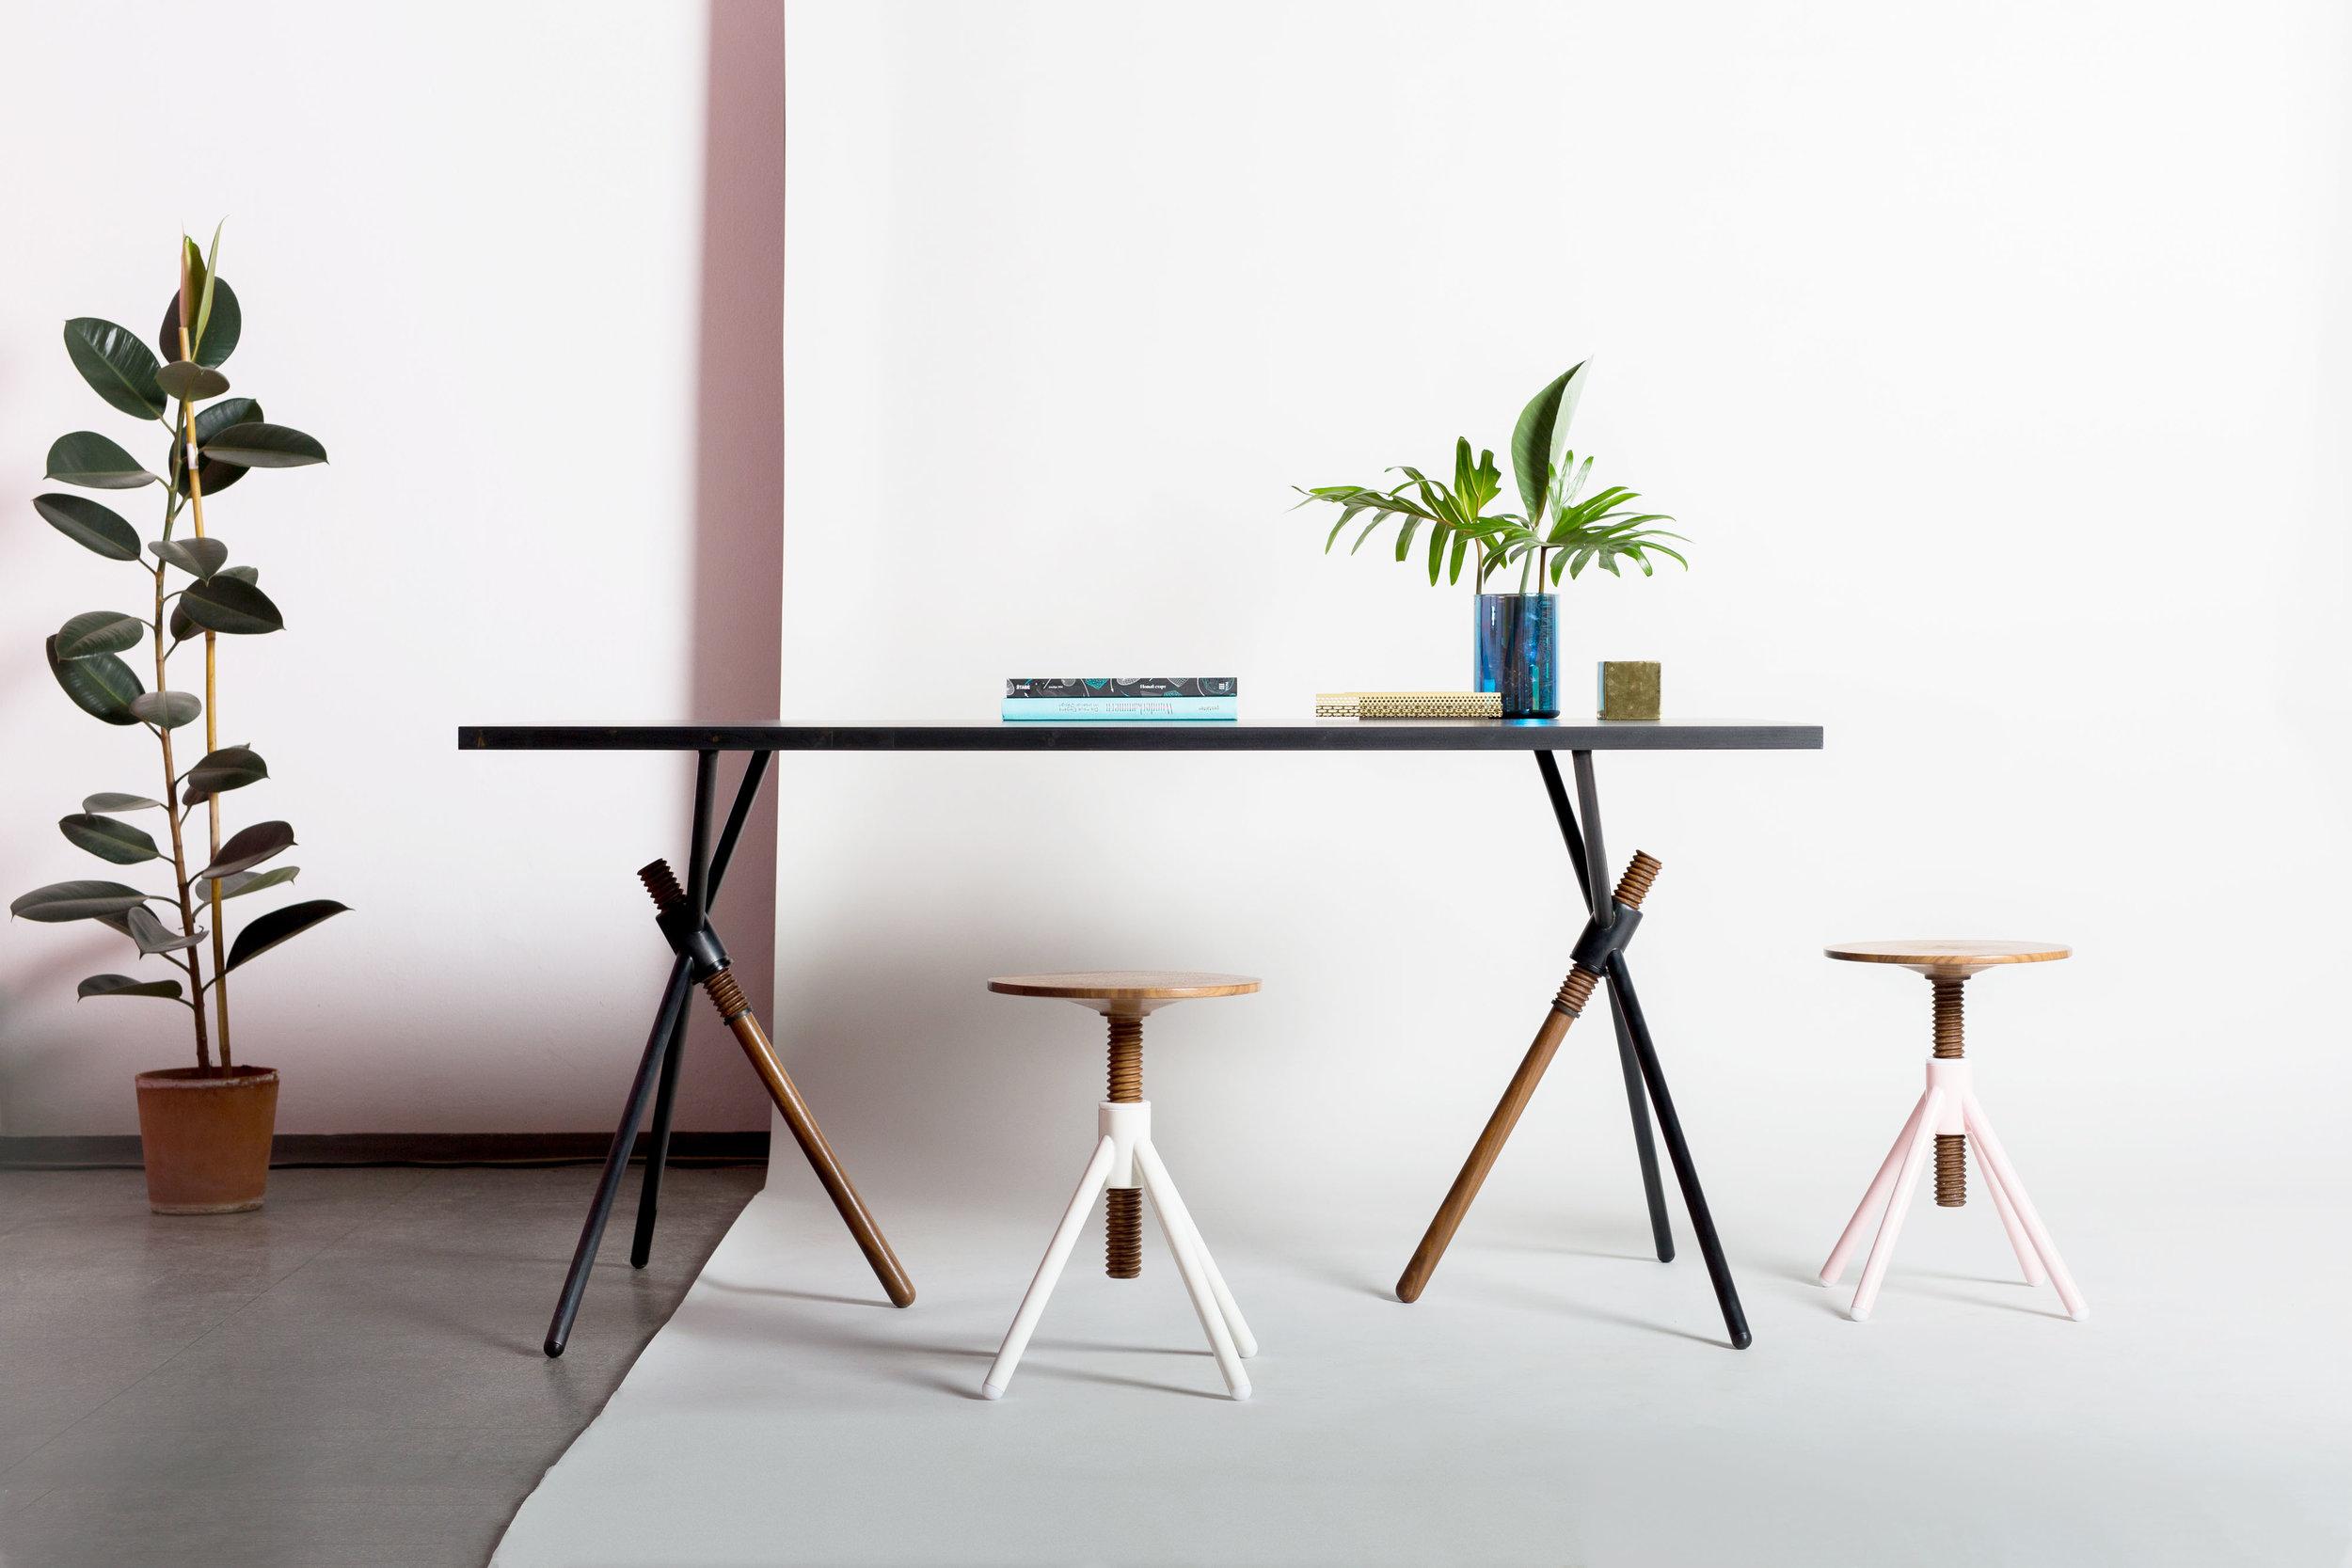 01_thread-family-table_furniture-design_coordination-berlin.jpg